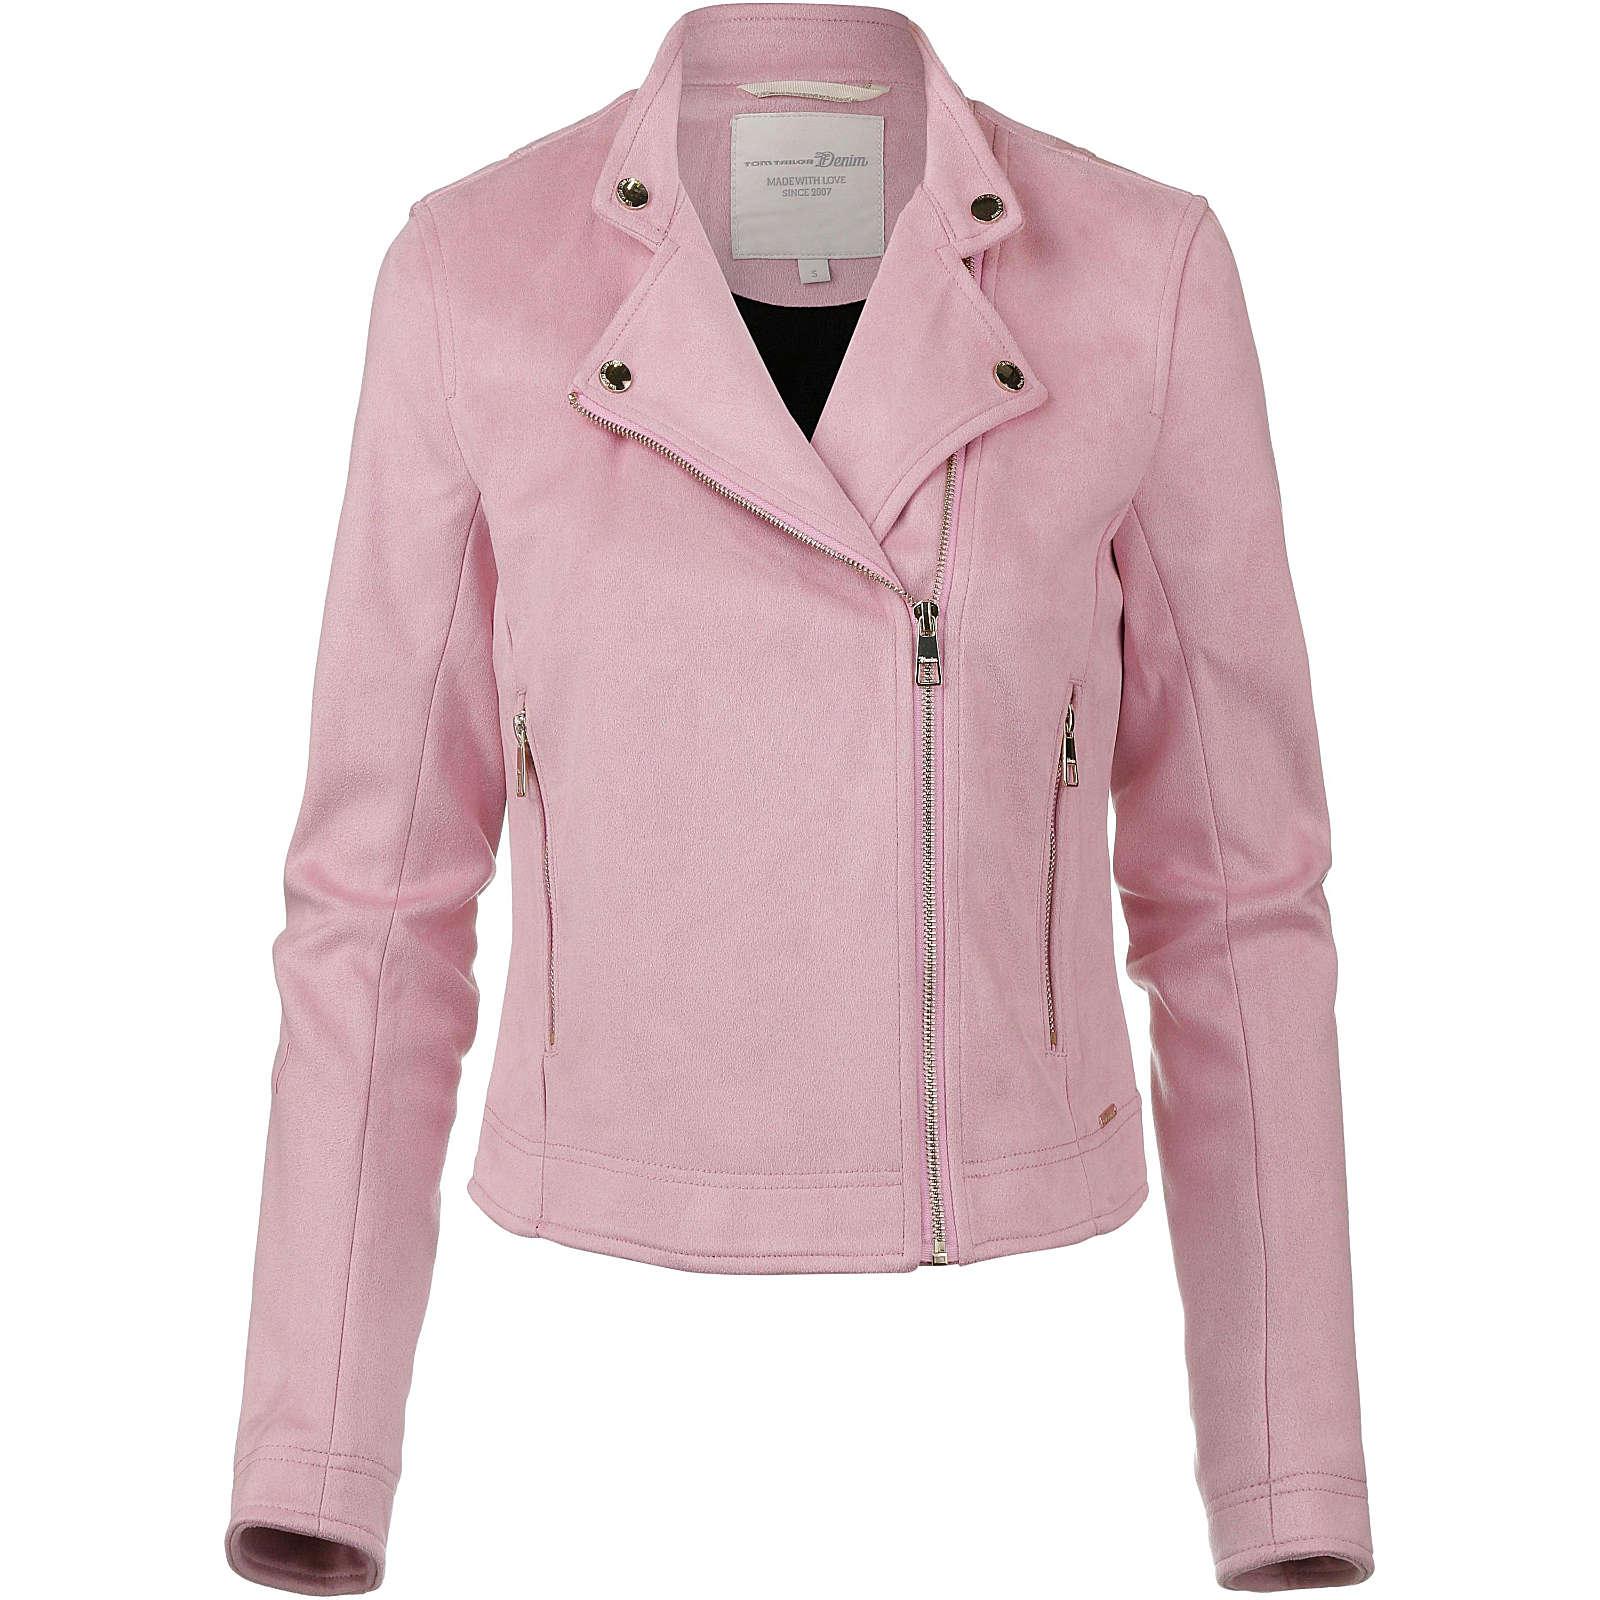 Tom Tailor Denim Bikerjacke Sweatblazer rosa Damen Gr. 40